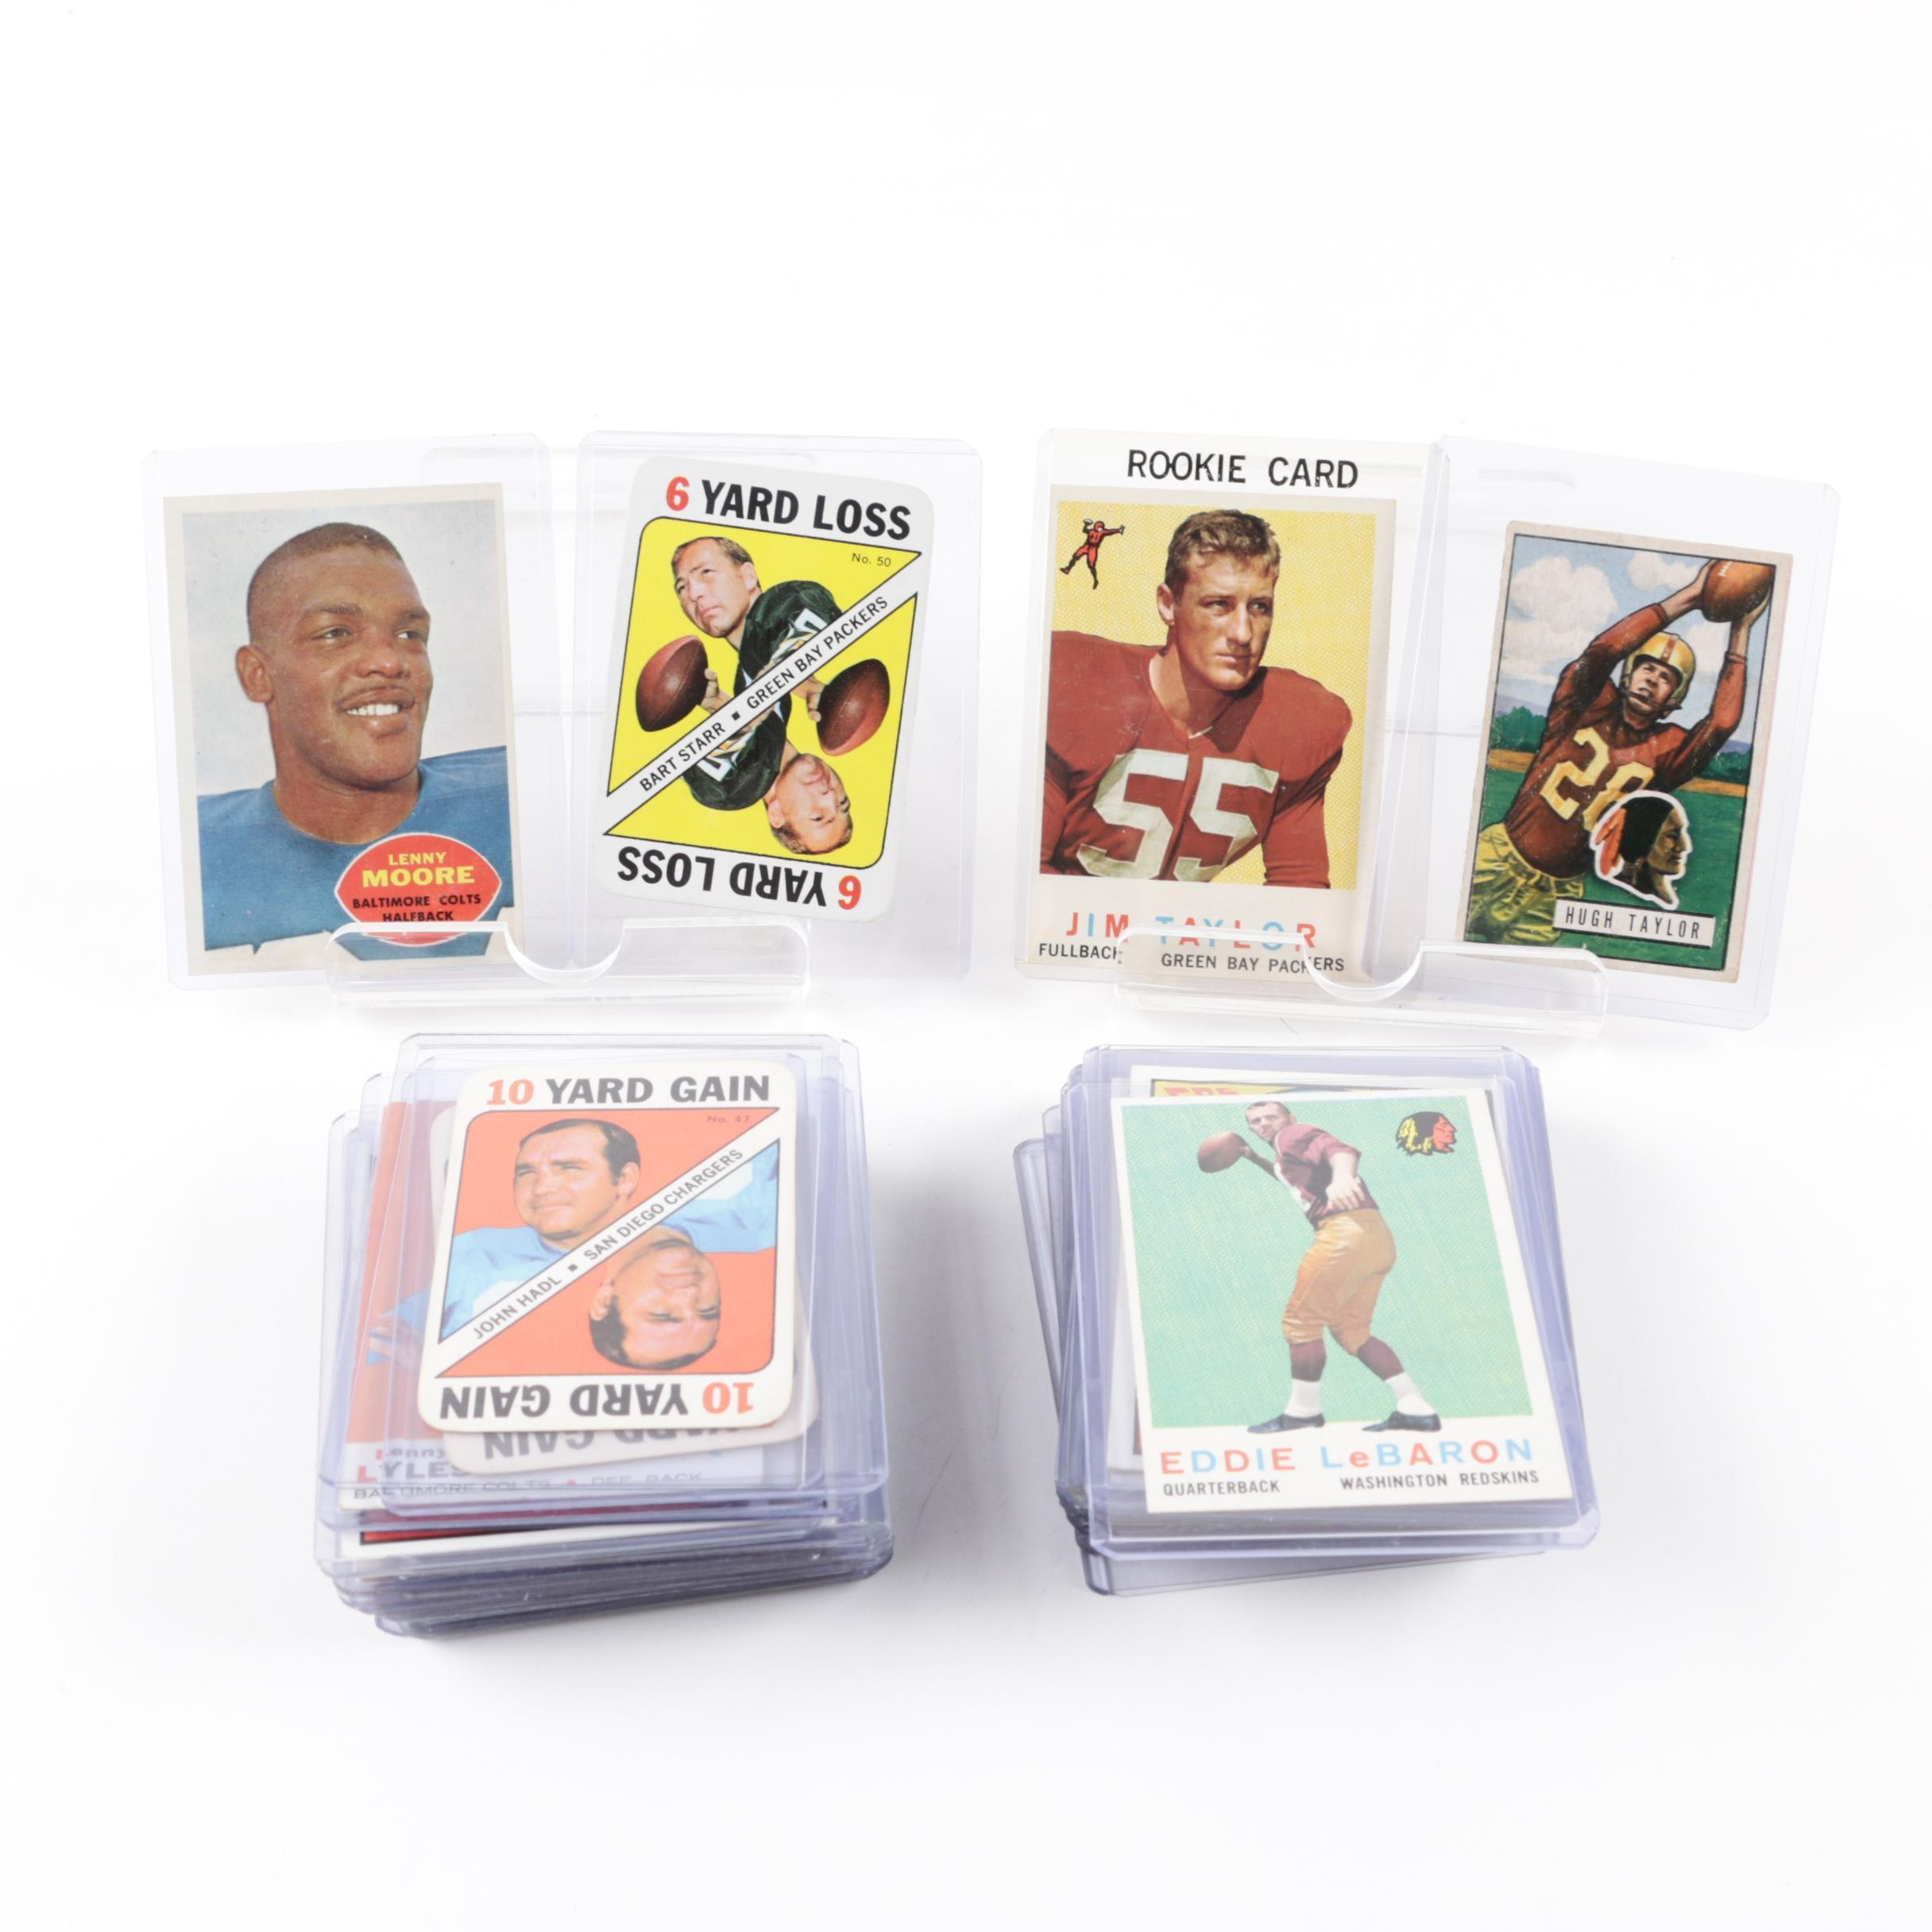 Vintage Football Cards with Bart Starr (HOF), Joe Namath(HOF), Jim Taylor Rookie